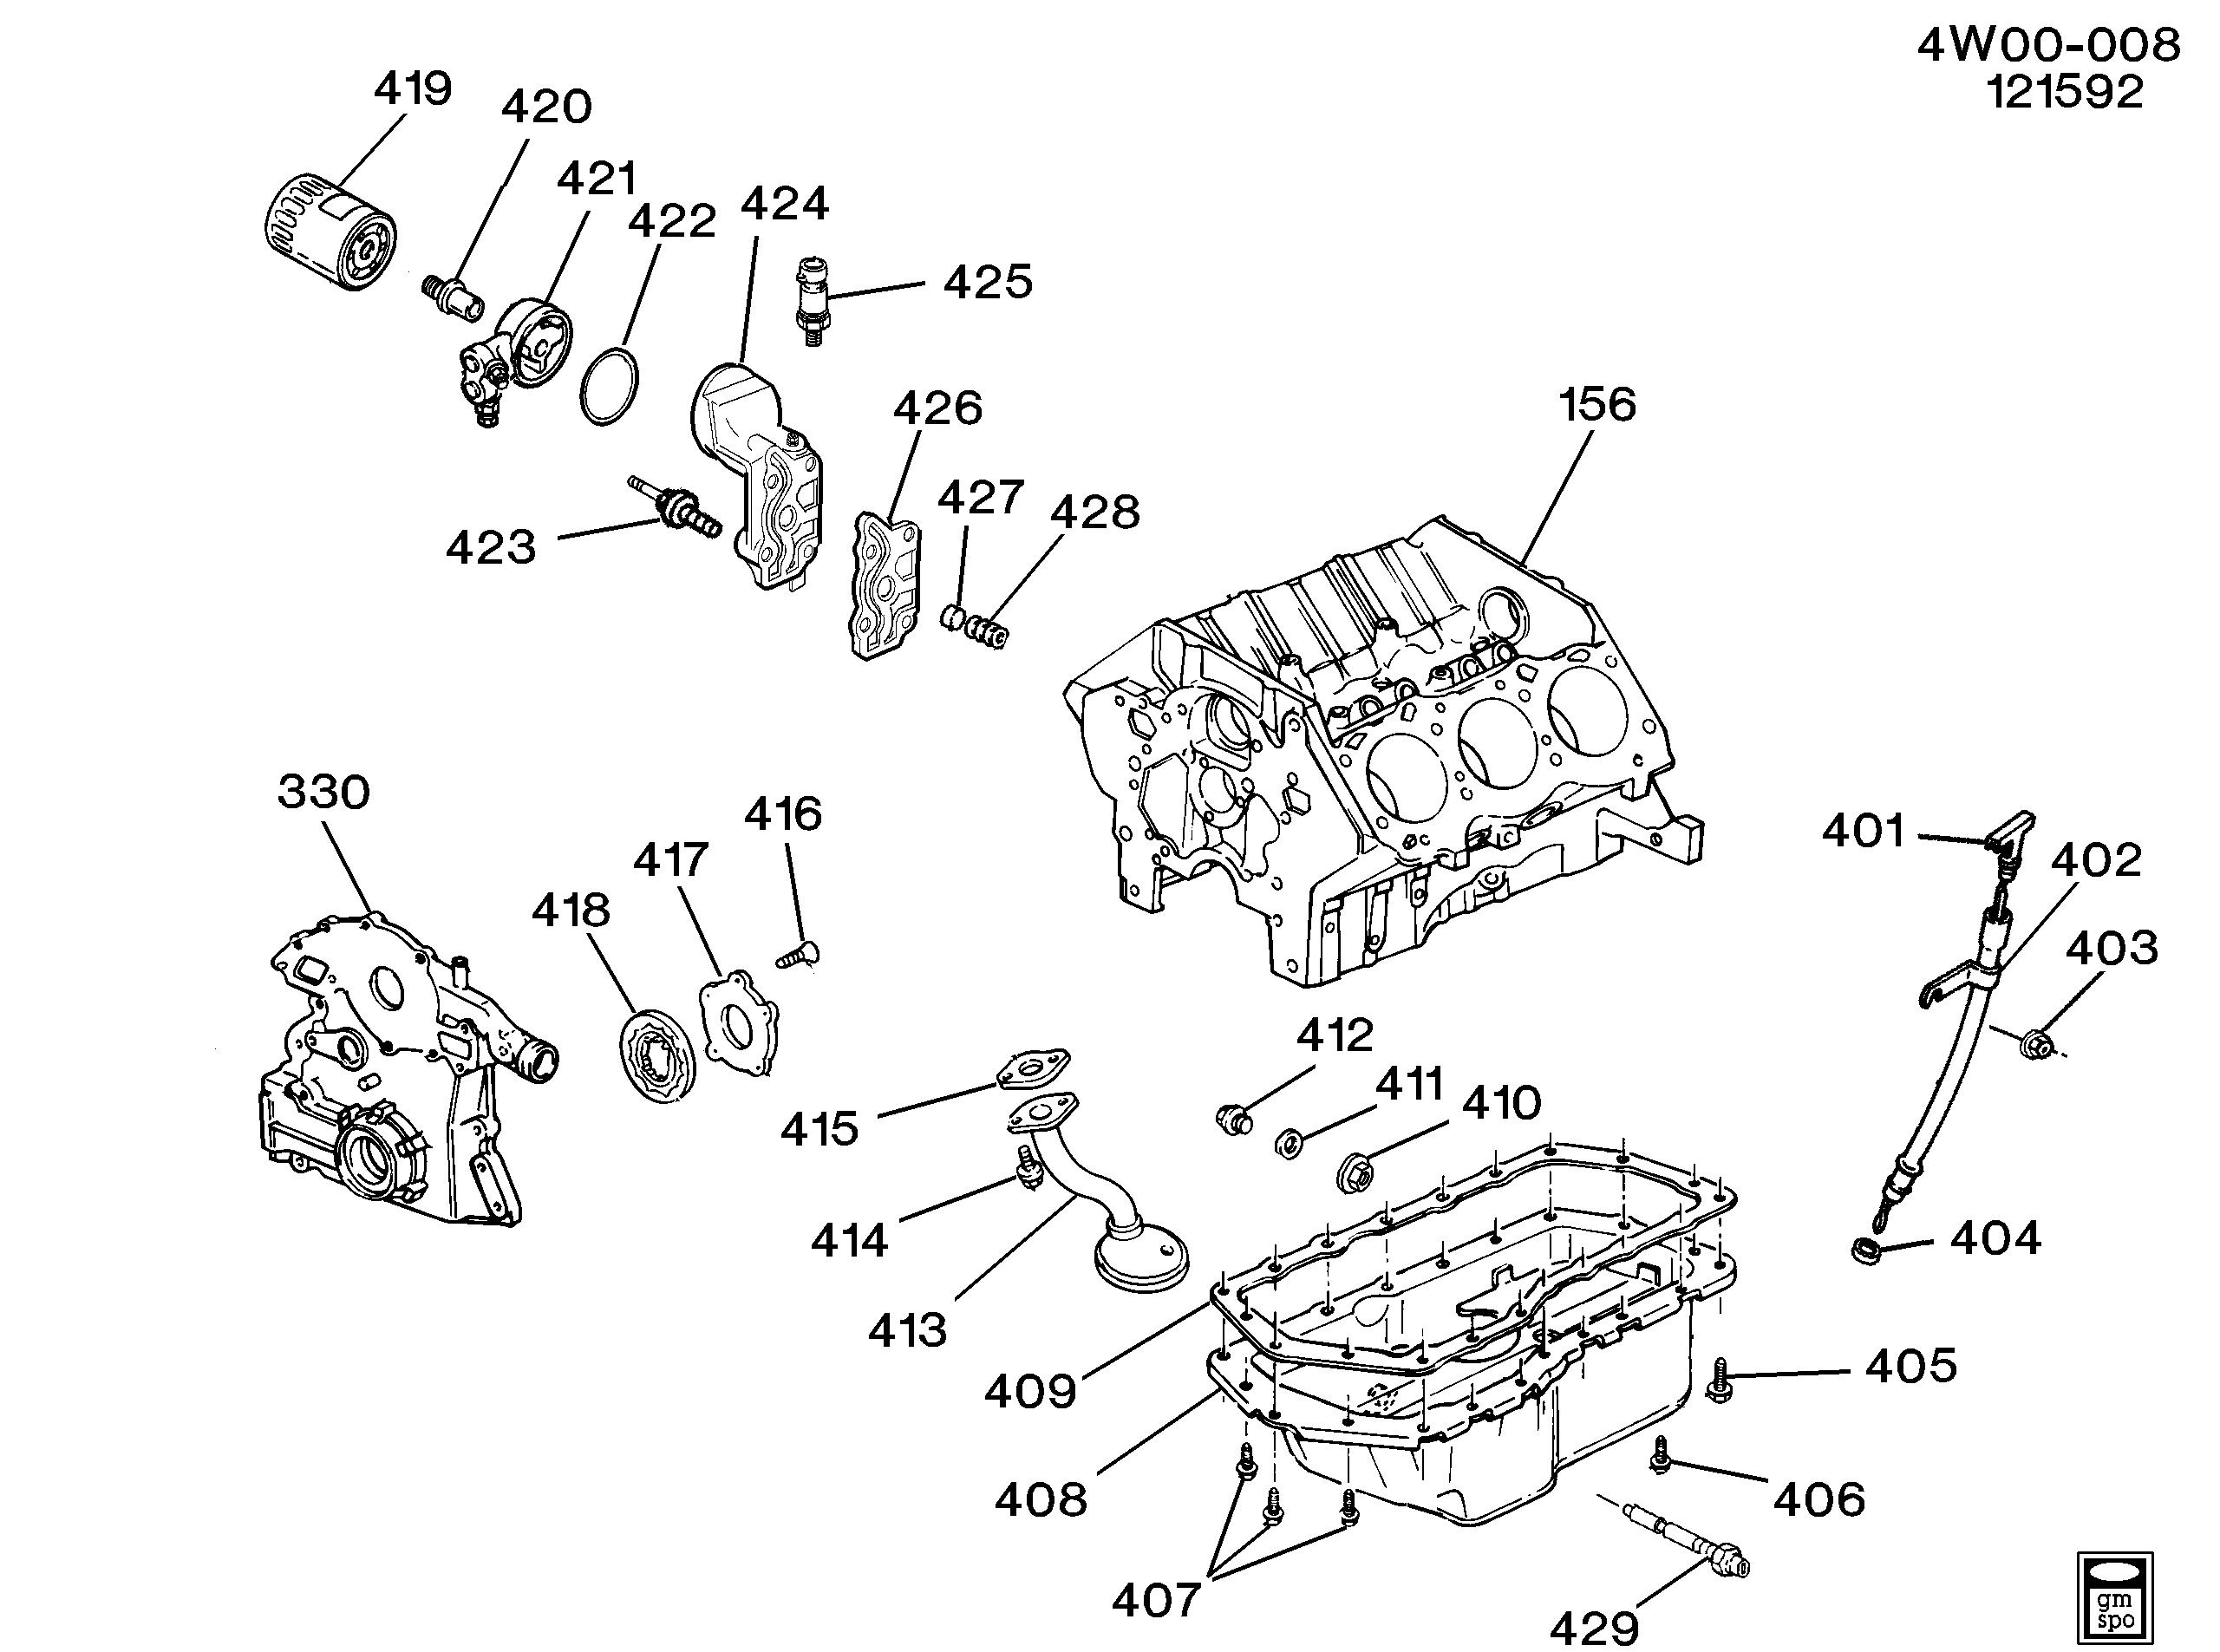 Buick Regal / Spare parts catalog EPC